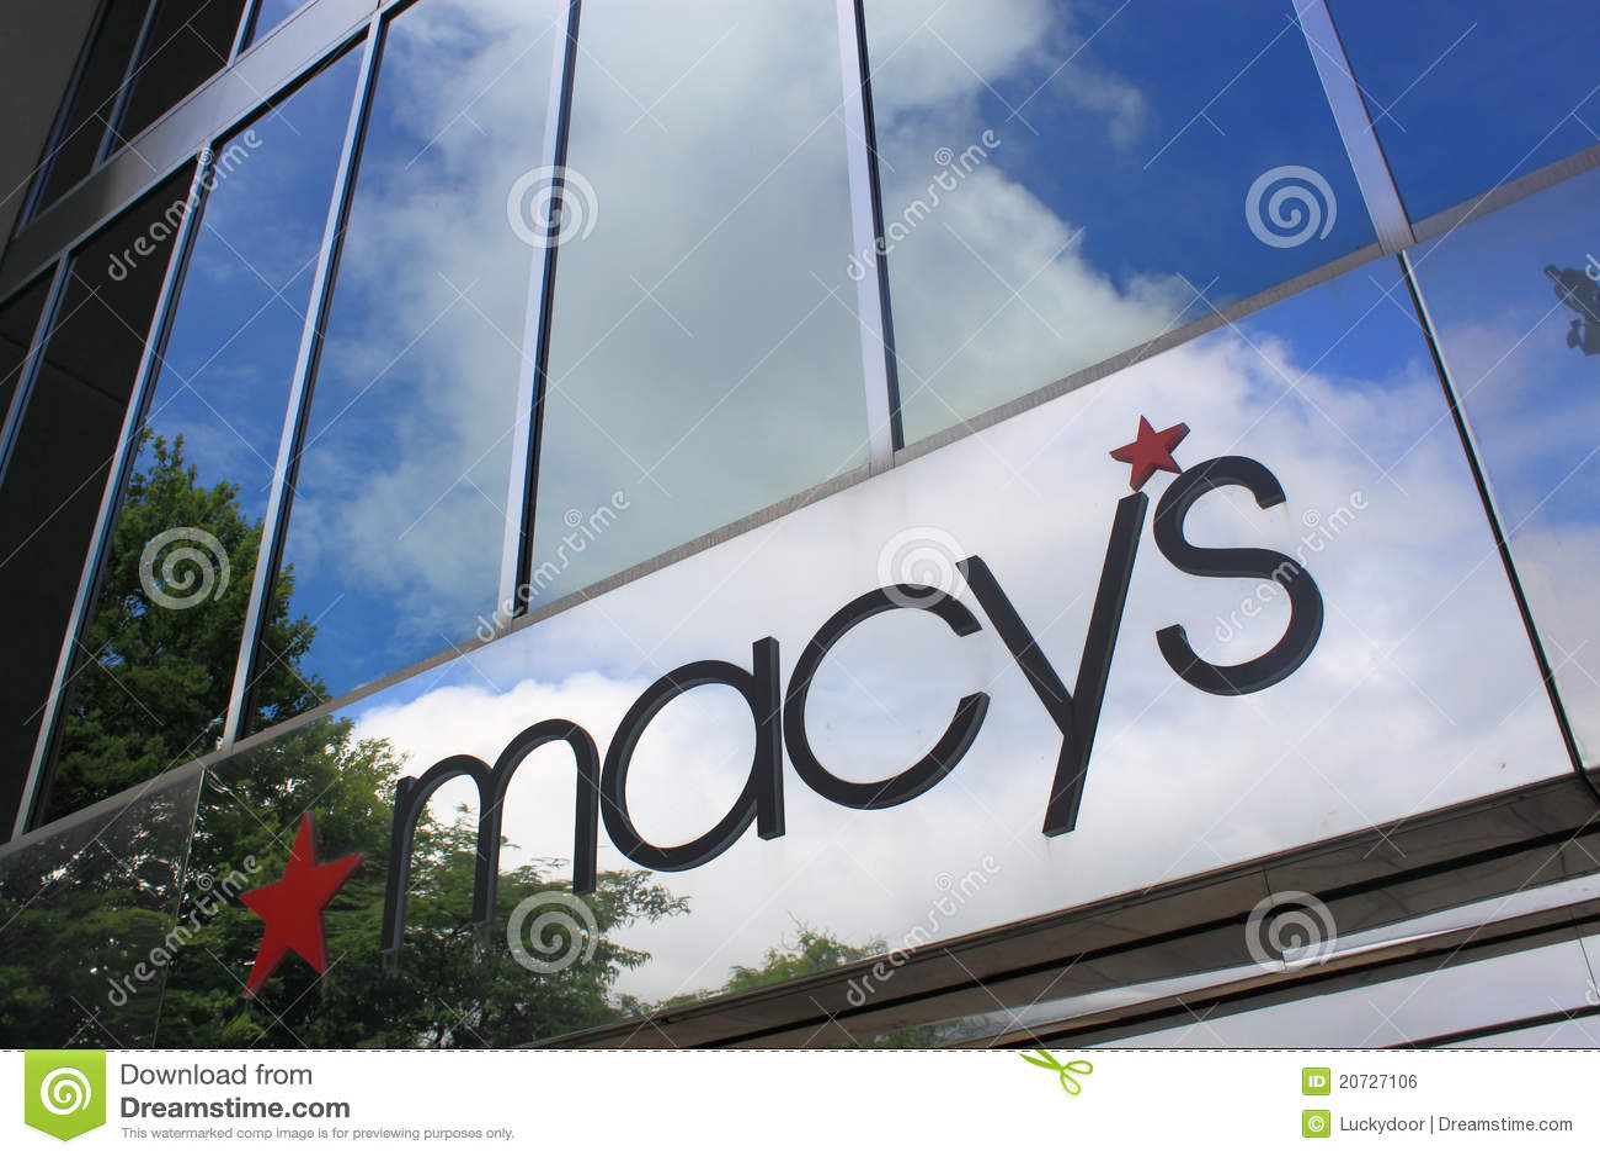 Muestra de Macy